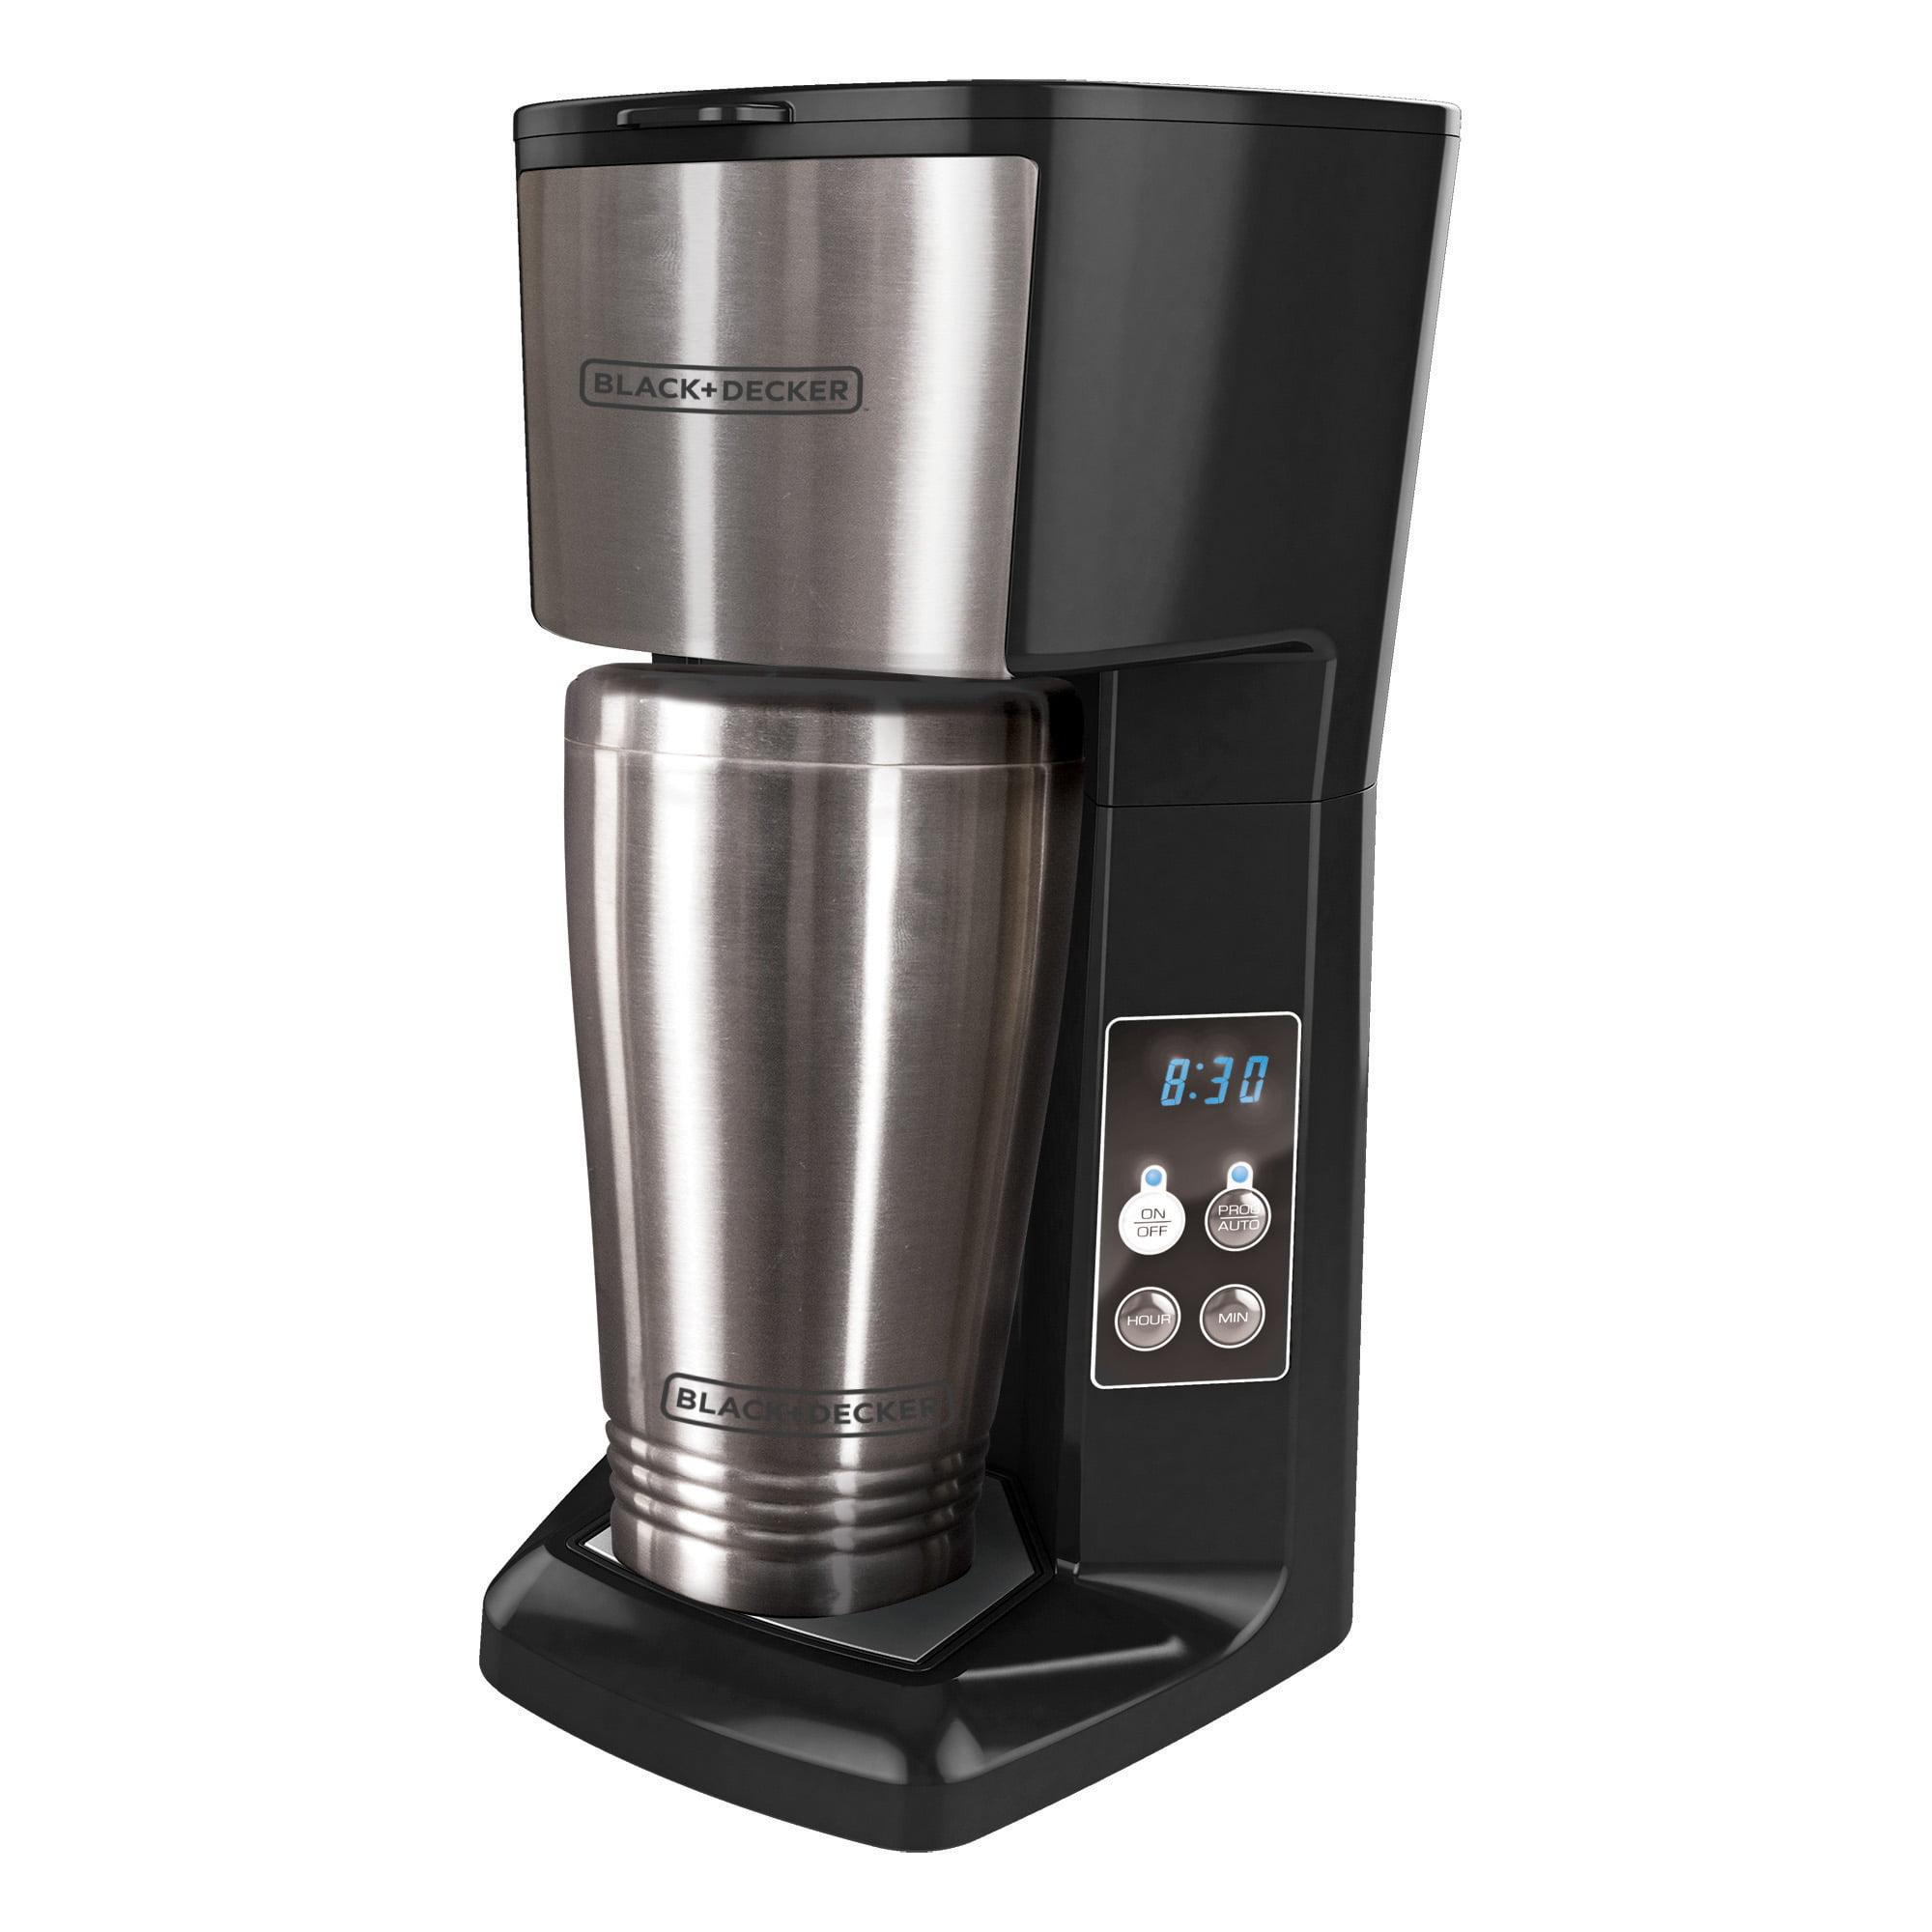 BLACK+DECKER Single Serve Programmable Coffeemaker, Black/Stainless Steel, CM625B